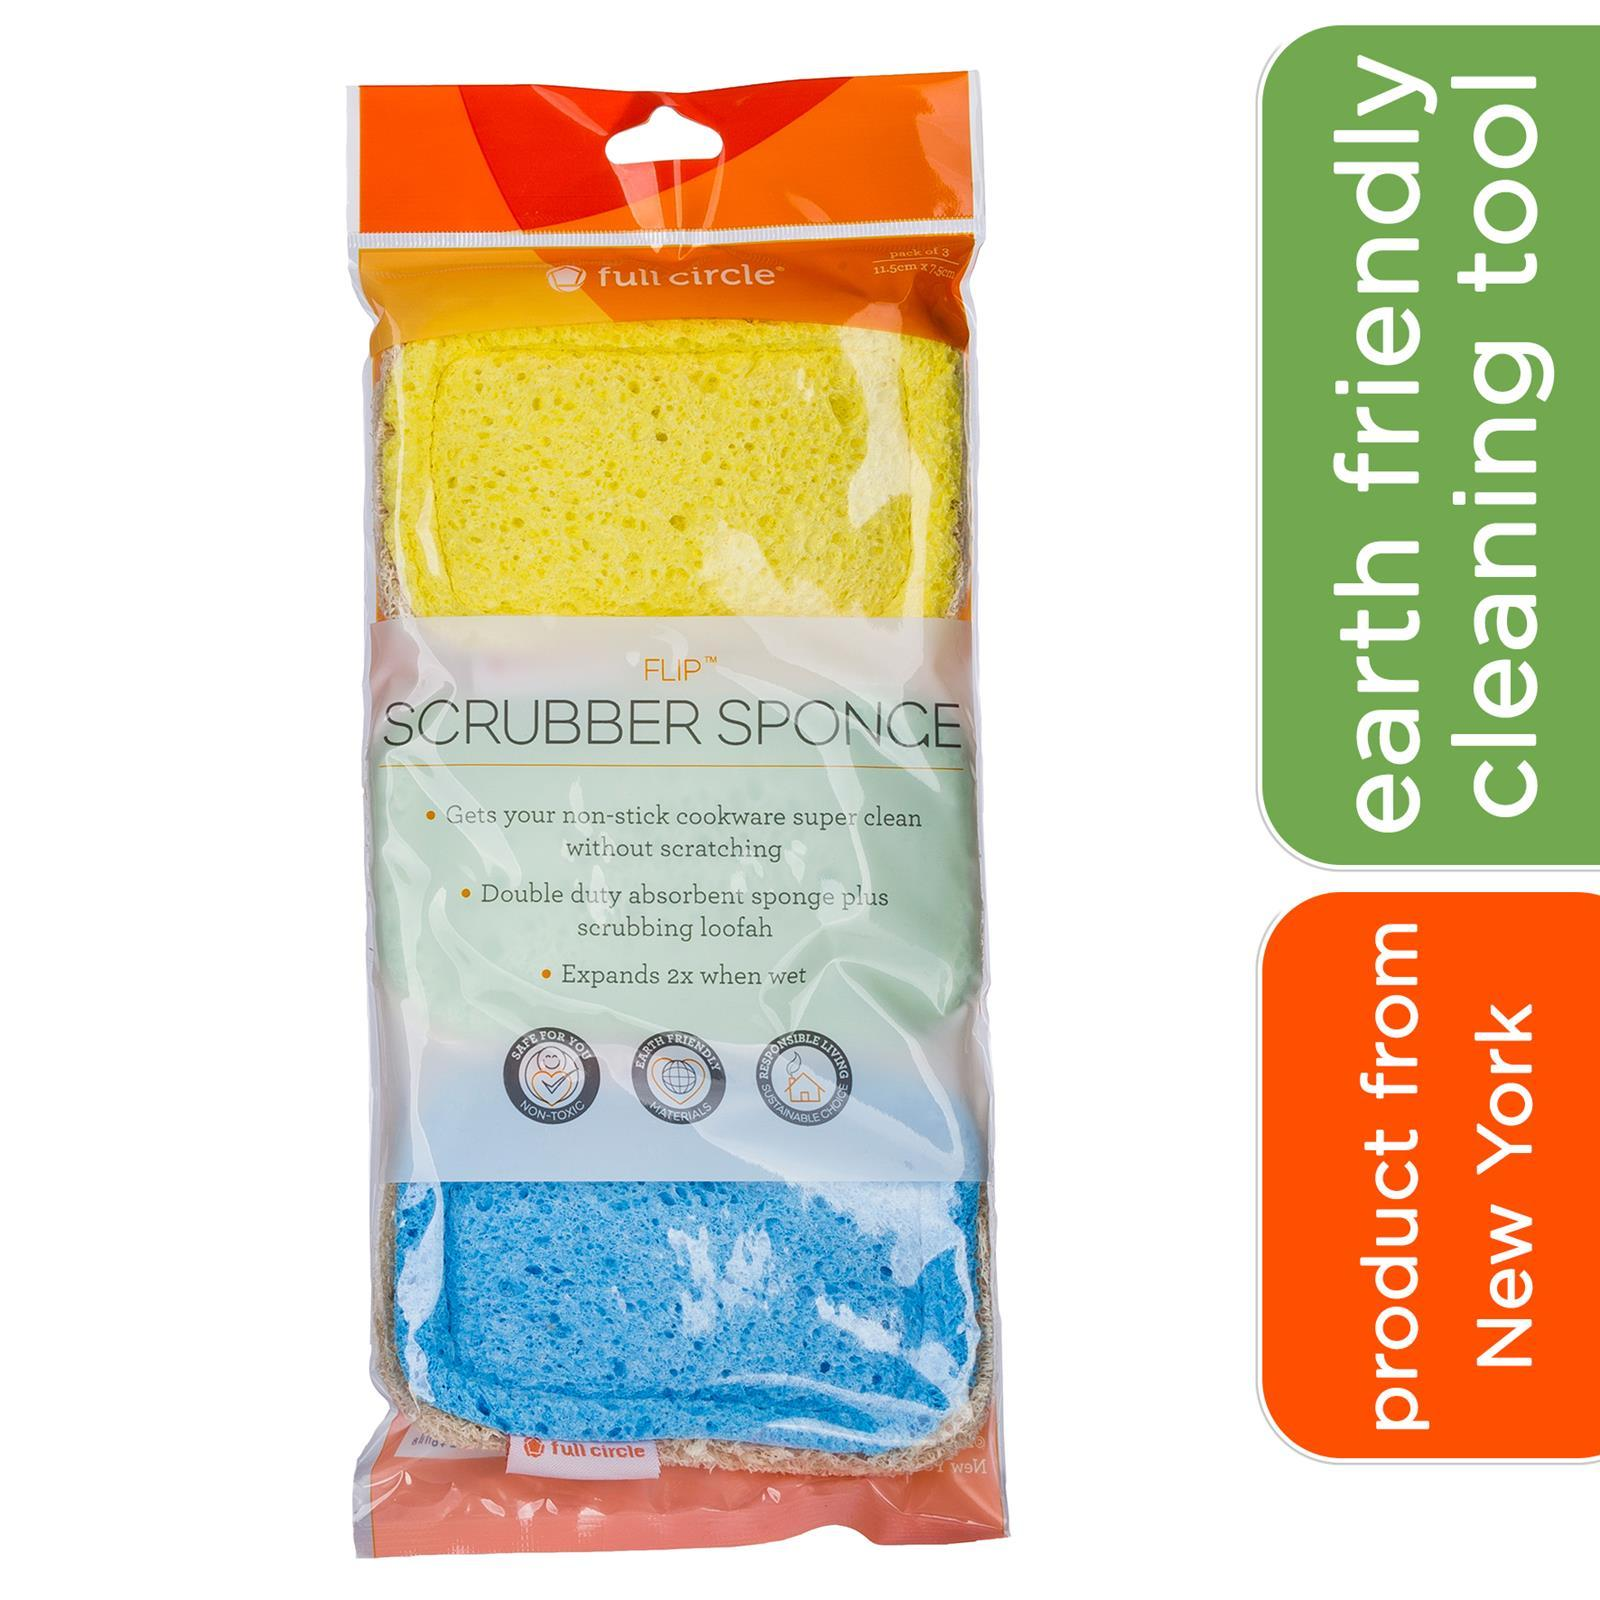 Full Circle Refresh Scrubber Sponge (set Of 3pcs) By Corlison.